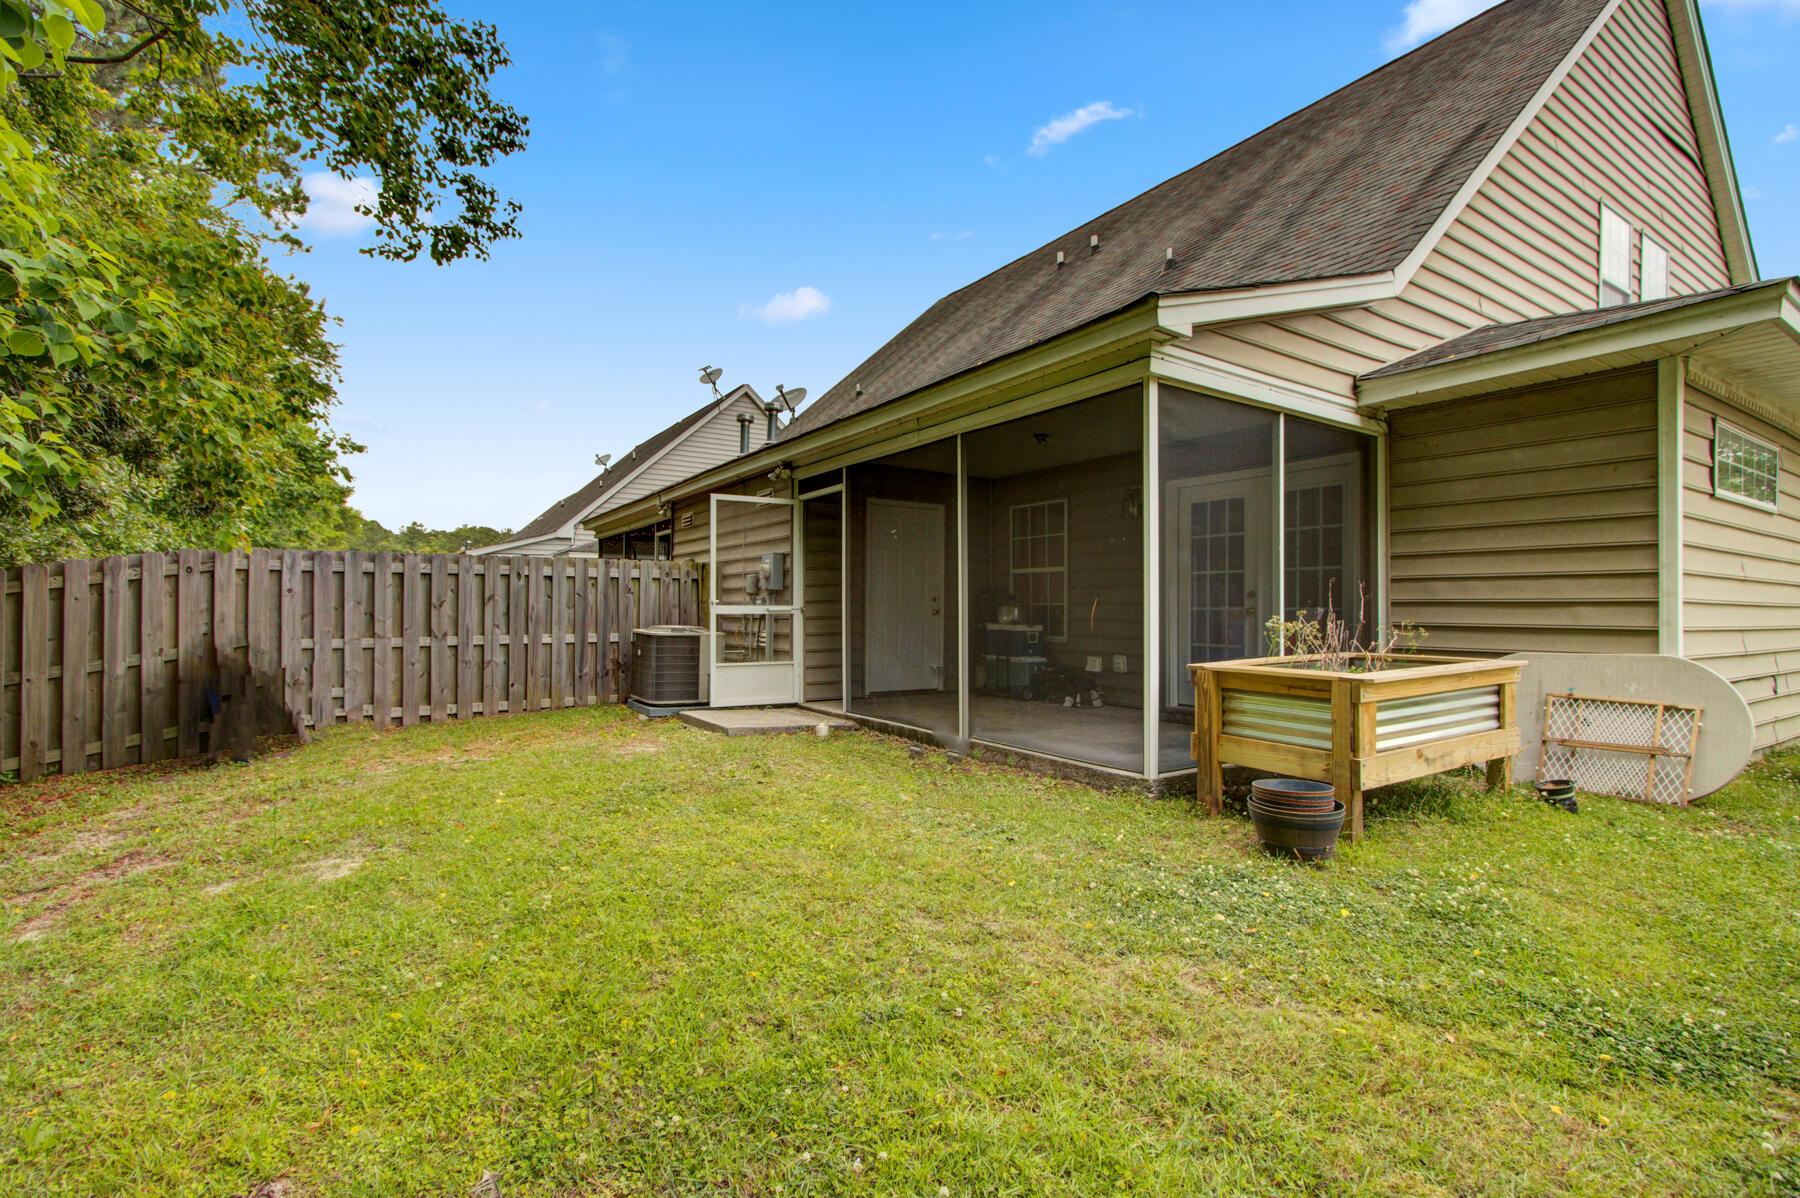 Dunes West Homes For Sale - 2232 Kings Gate, Mount Pleasant, SC - 11